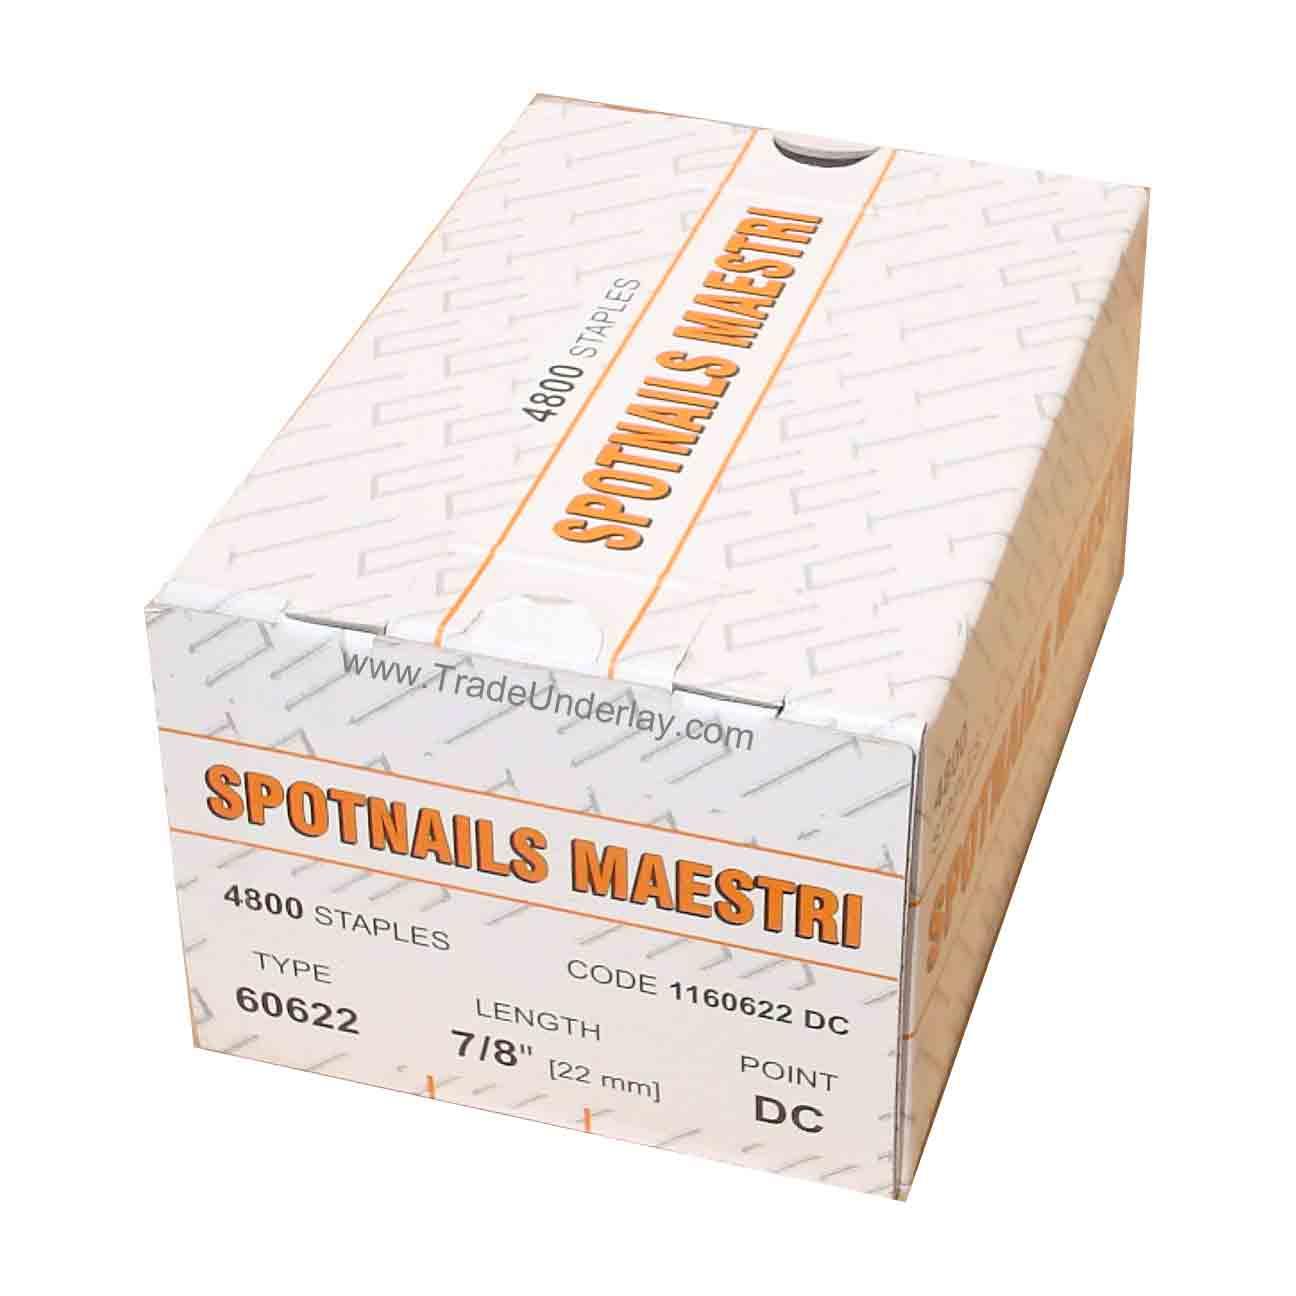 Spotnails Maestri 60622 Flooring Staples 606/22mm X 4800